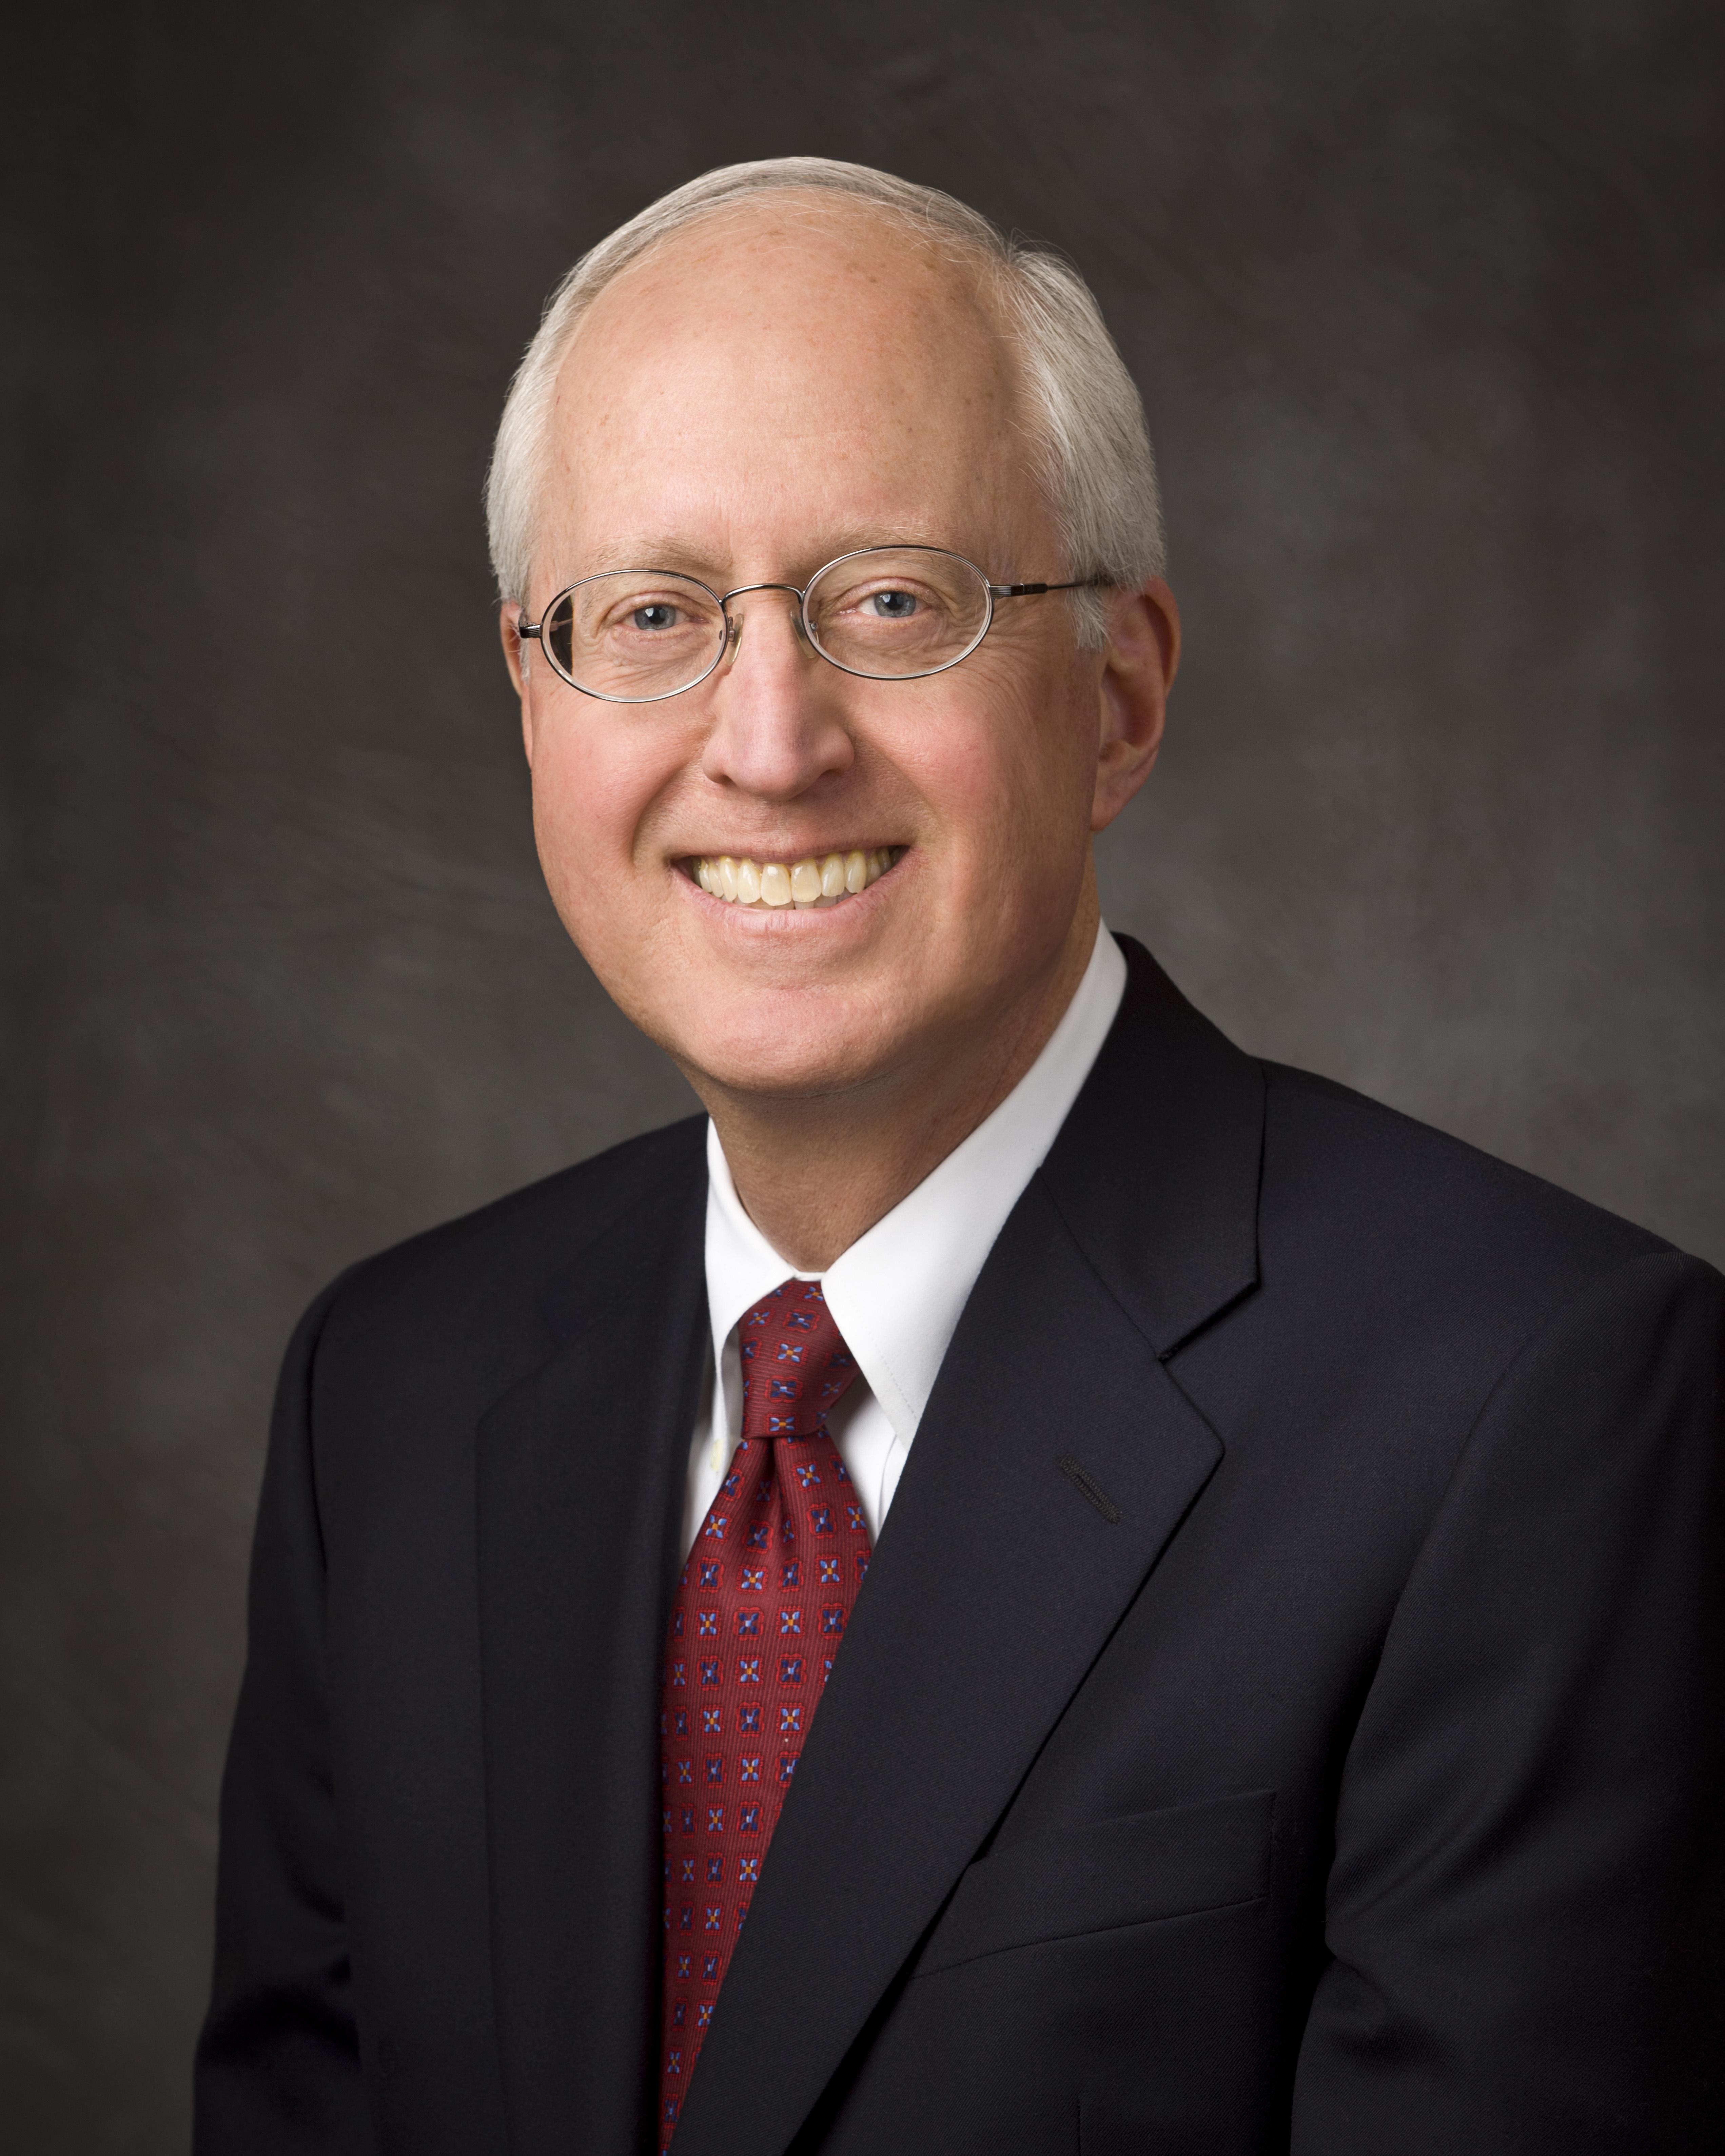 Elder Larry Y. Wilson, General Authority Seventy